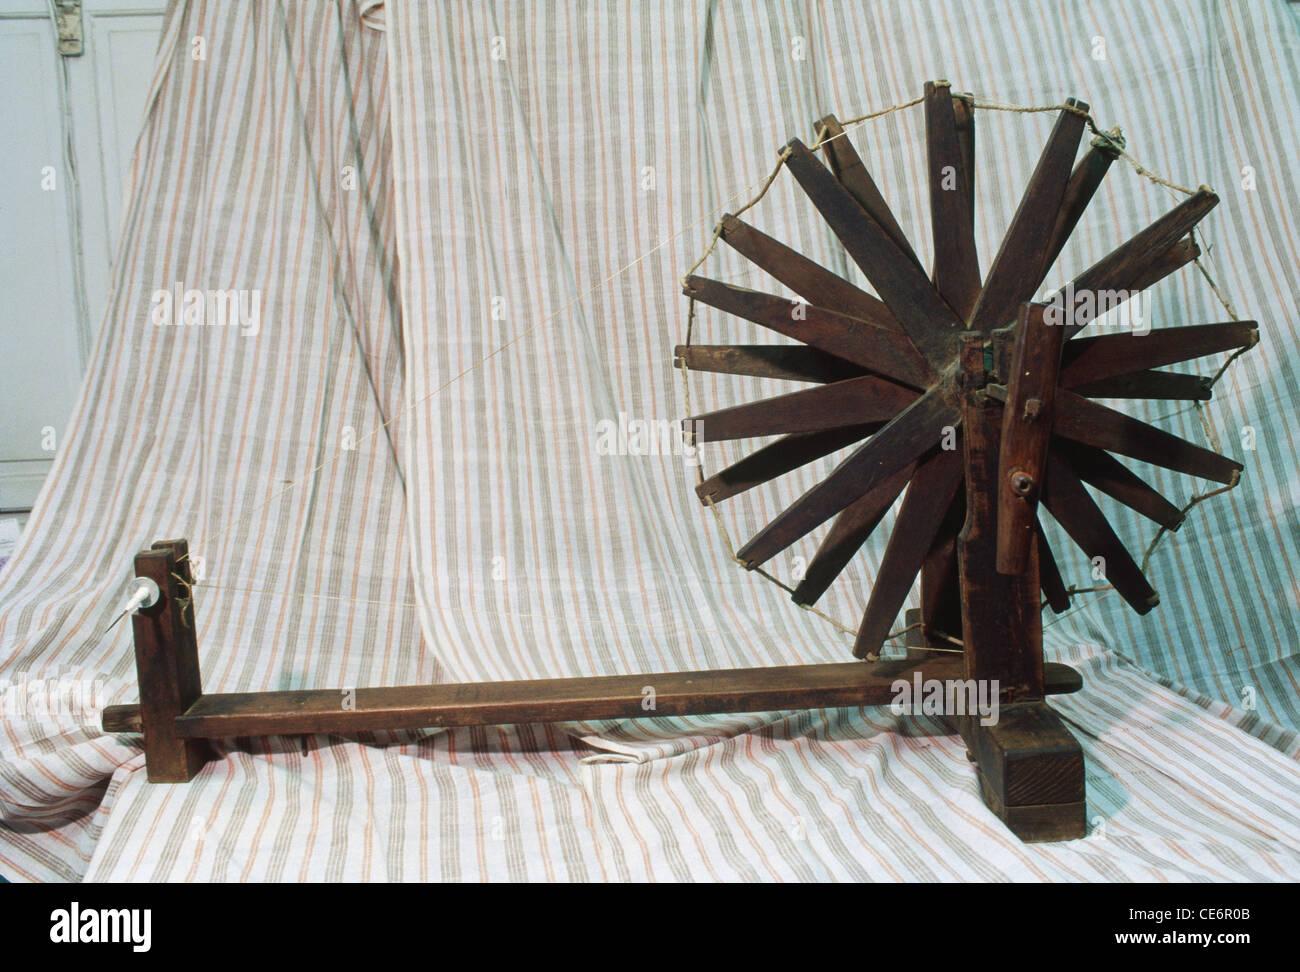 Mahatma Gandhi Spinning wheel charkha india Stock Photo